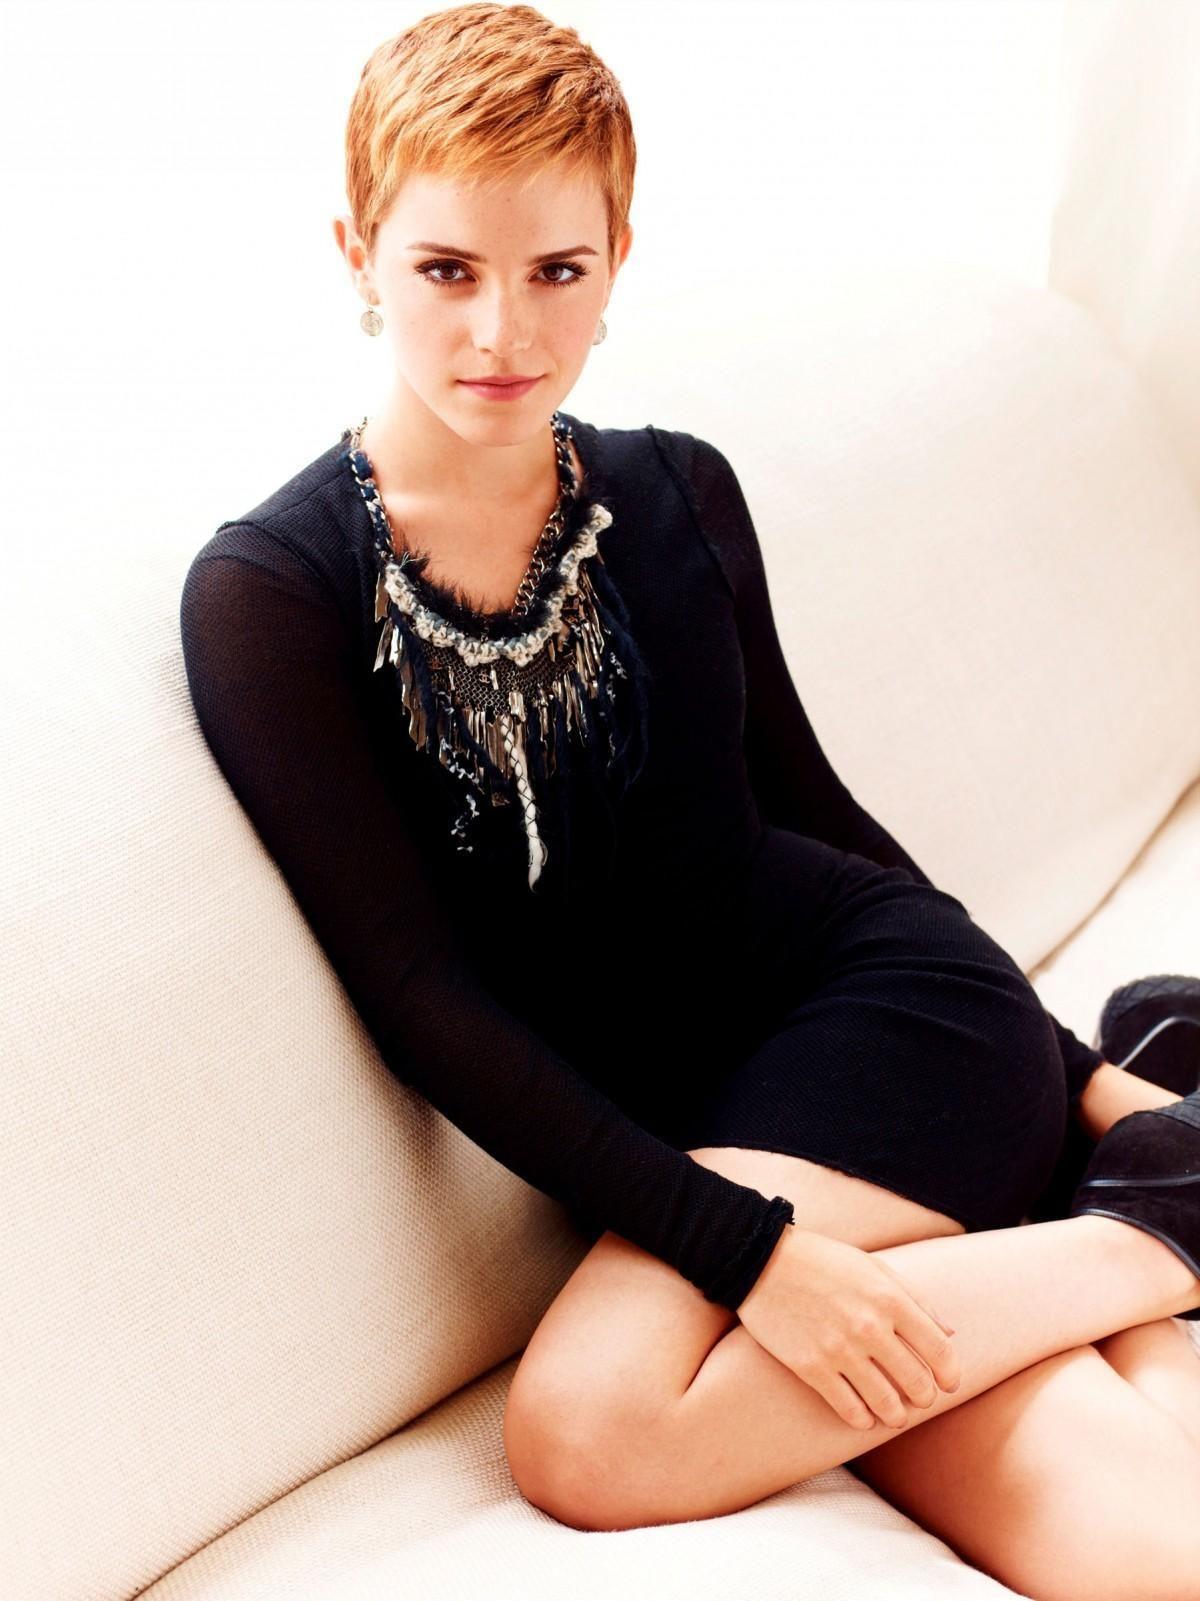 Love Emma Watson Emma Watson Legs Emma Watson Short Hair Emma Watson Sexiest